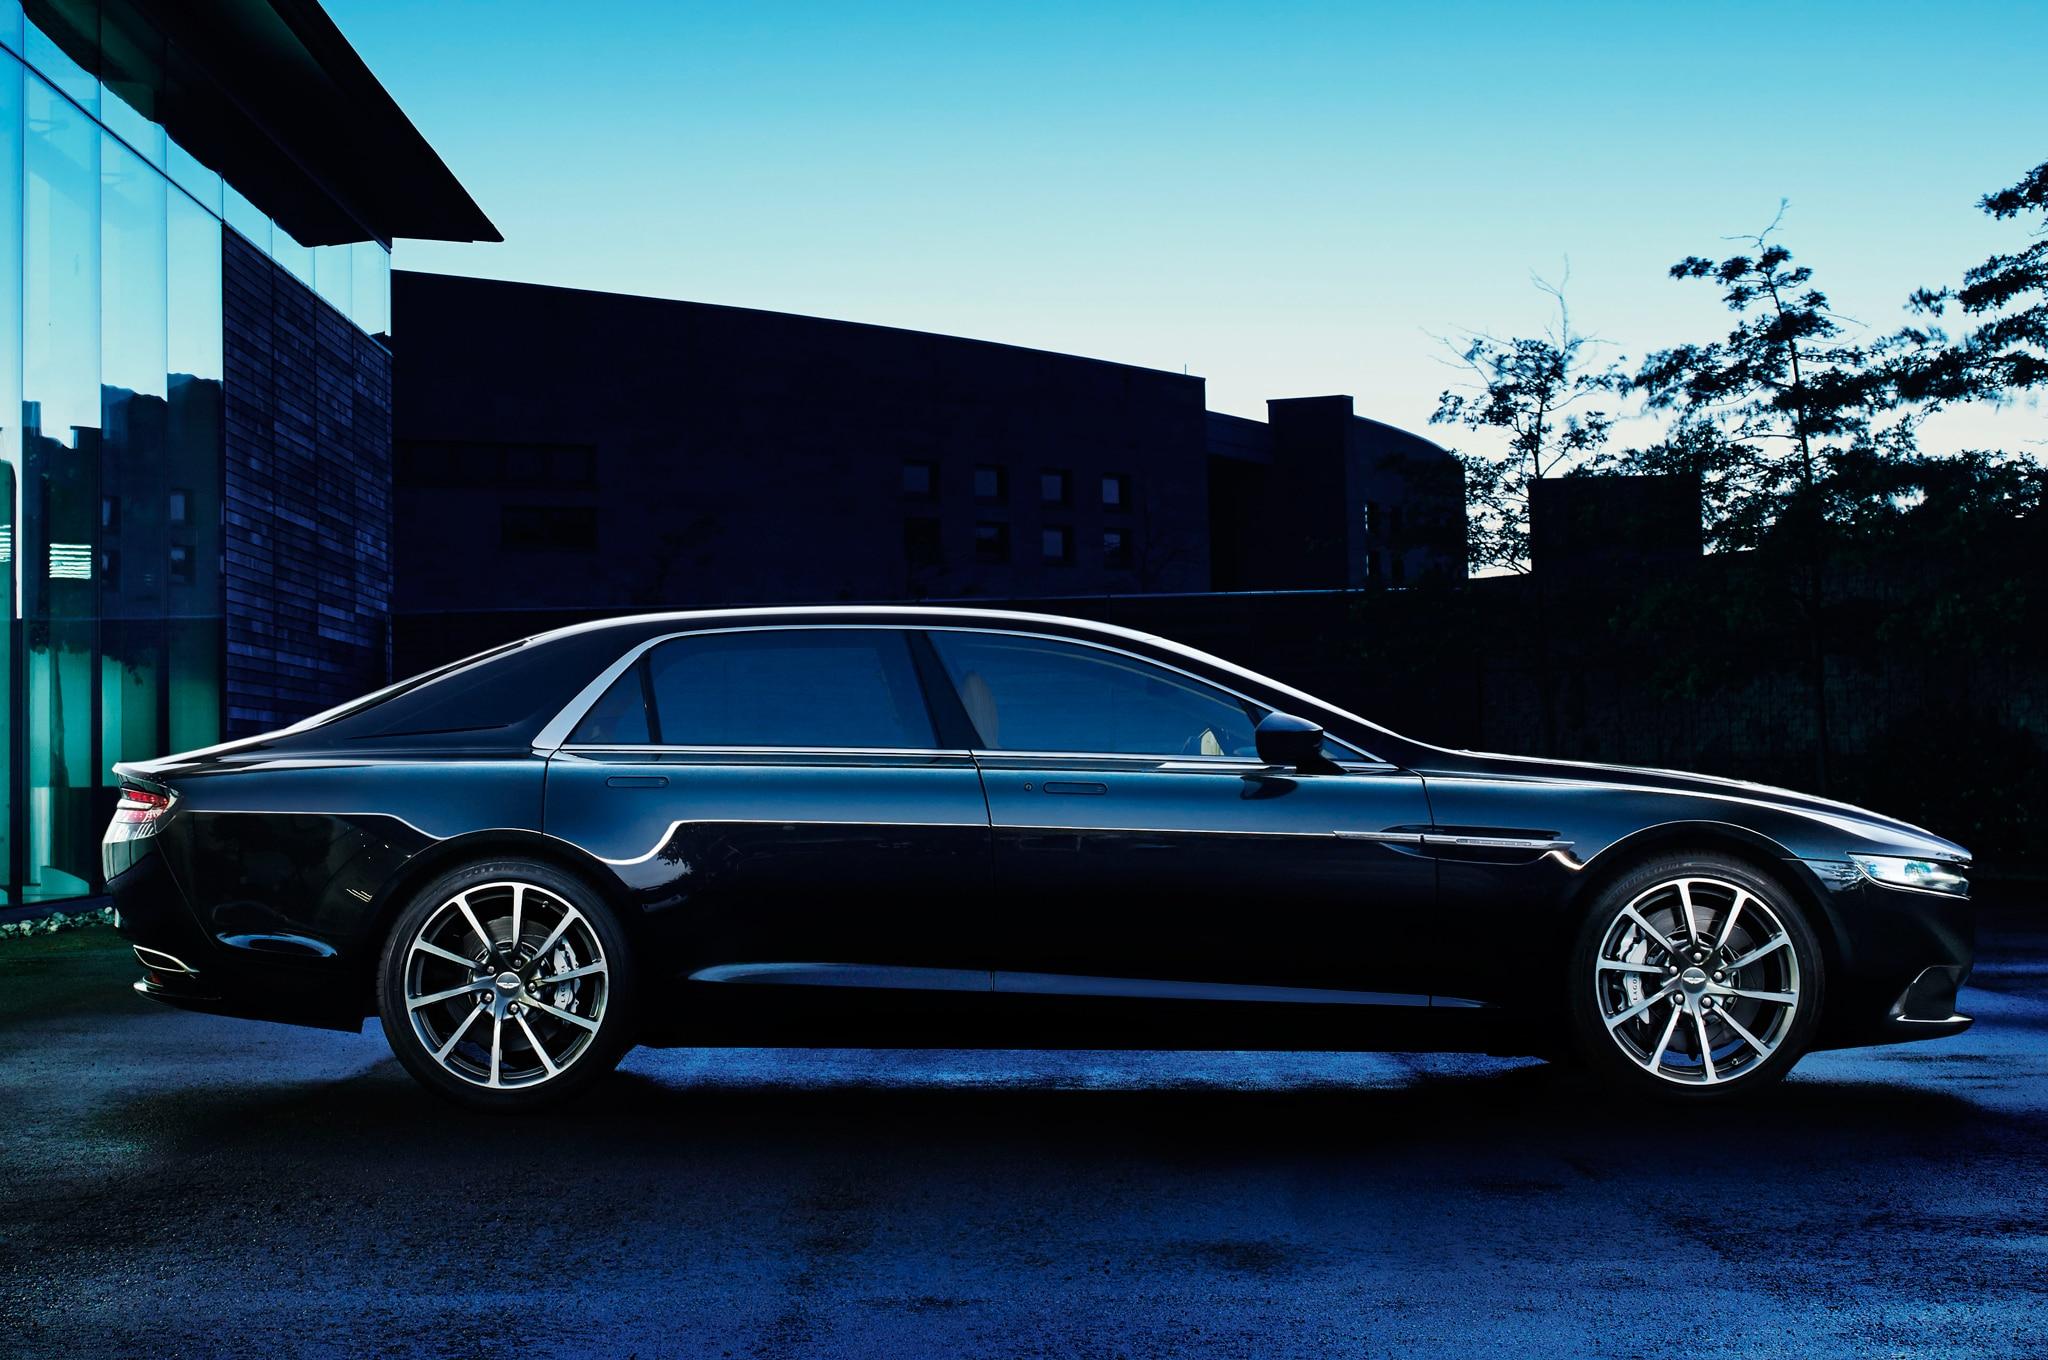 Aston Martin Lagonda Production Model Shown